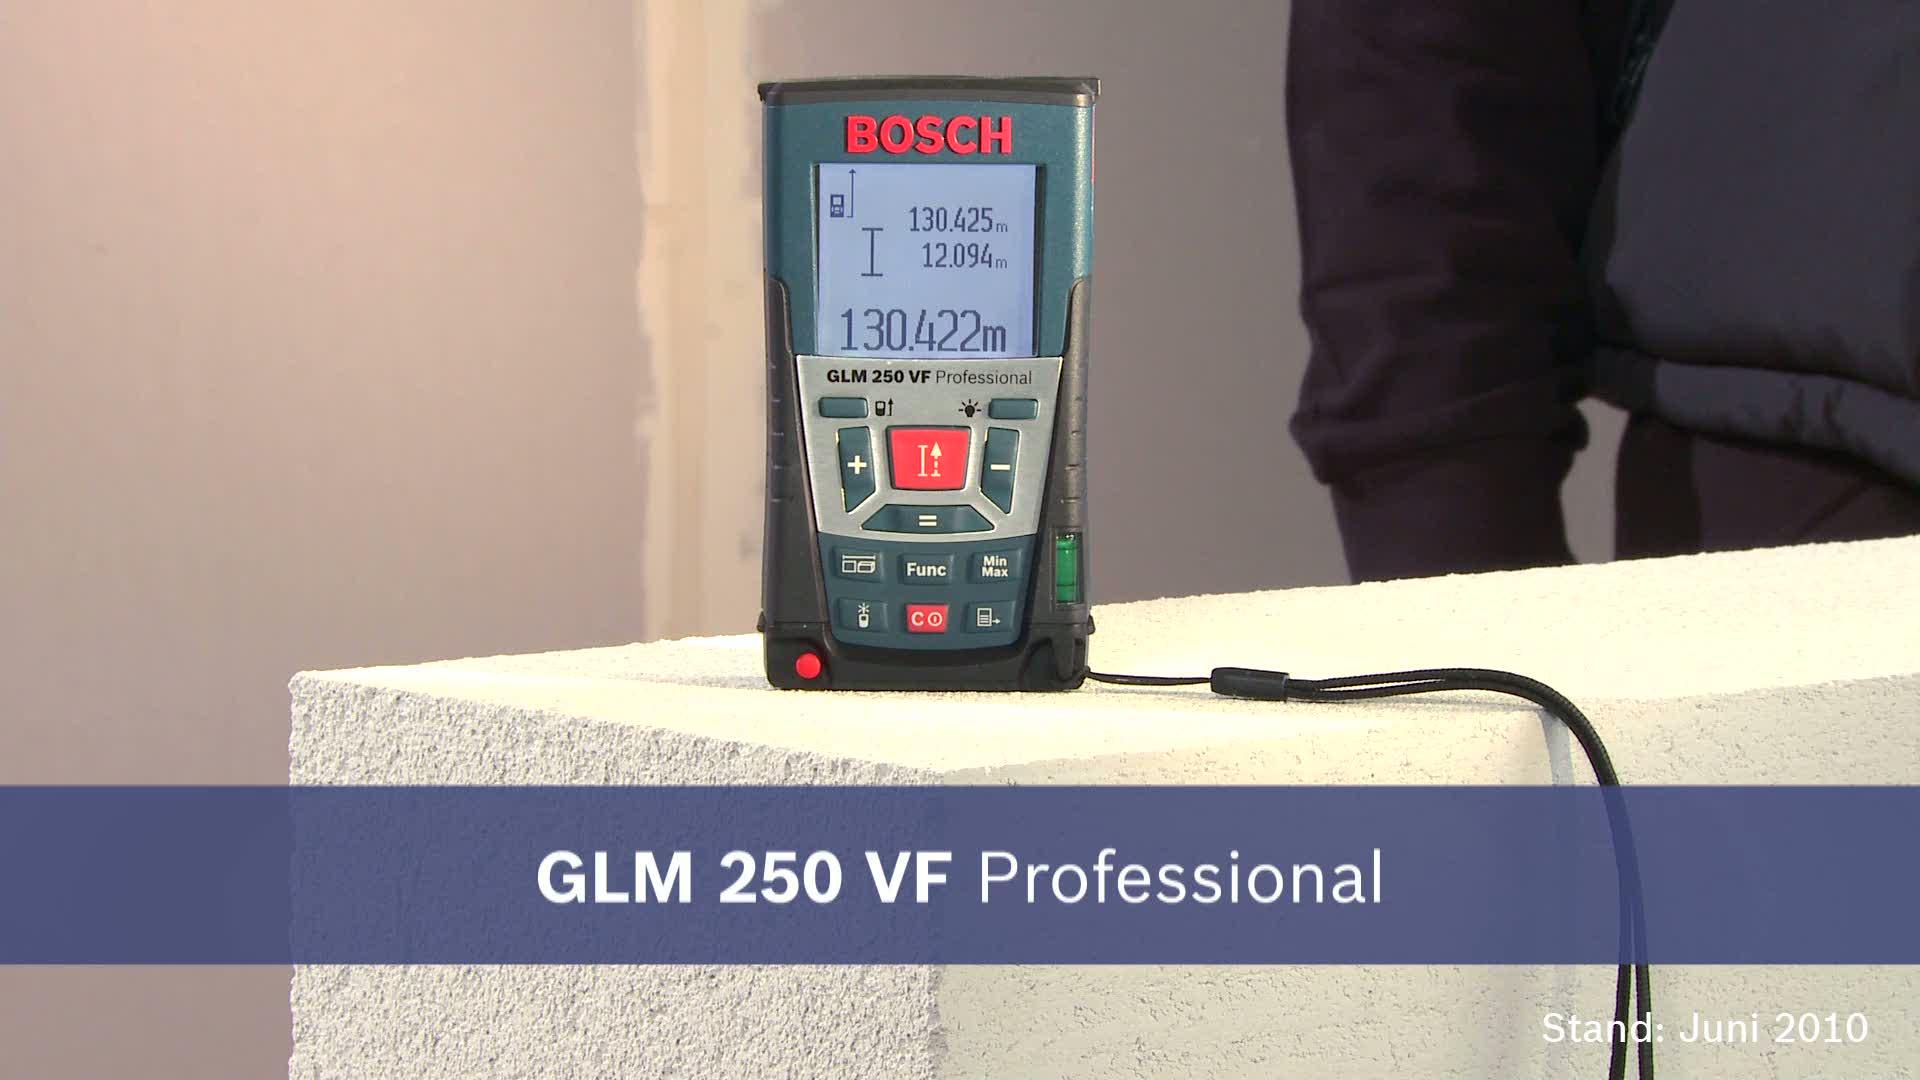 Laser Entfernungsmesser Bosch Glm 250 Vf : Glm 250 vf laser entfernungsmesser bosch professional